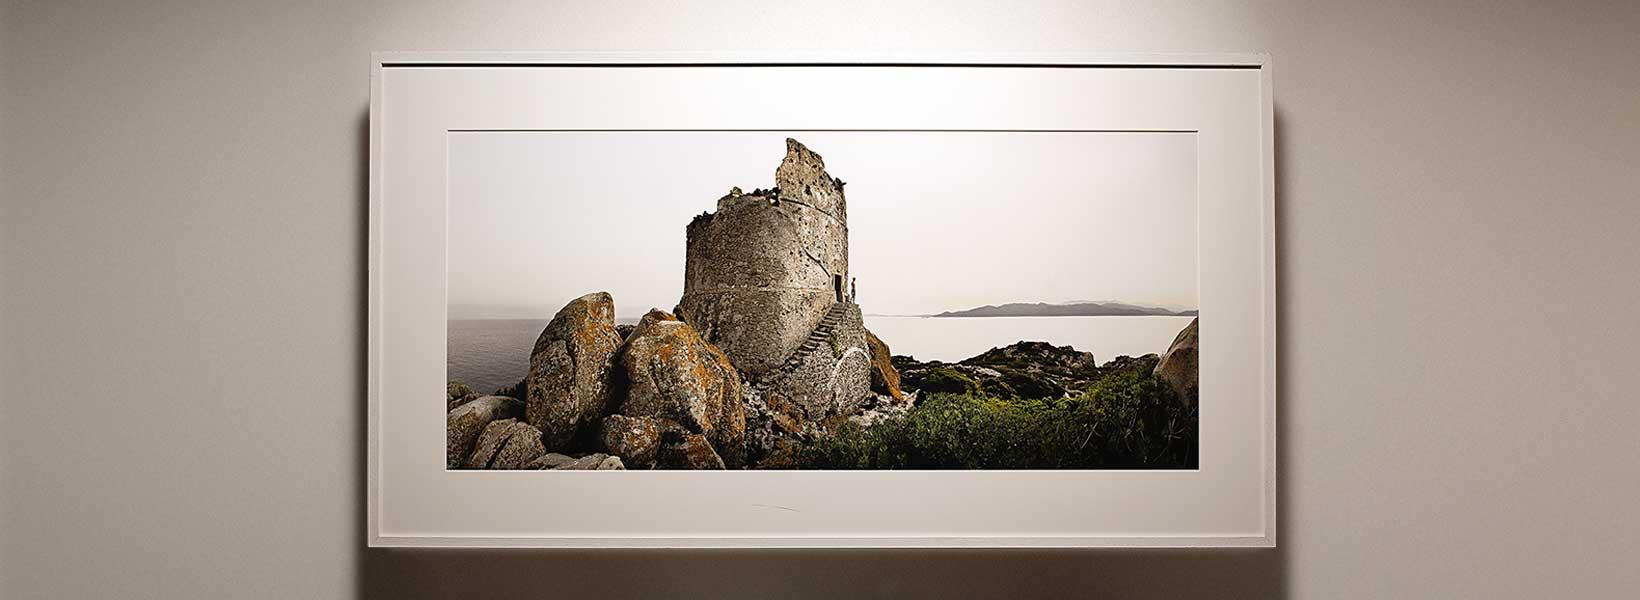 Serpentara Torre 2012 / 130 X 70 cm / Luca Tamagnini Catalogo 2012-009